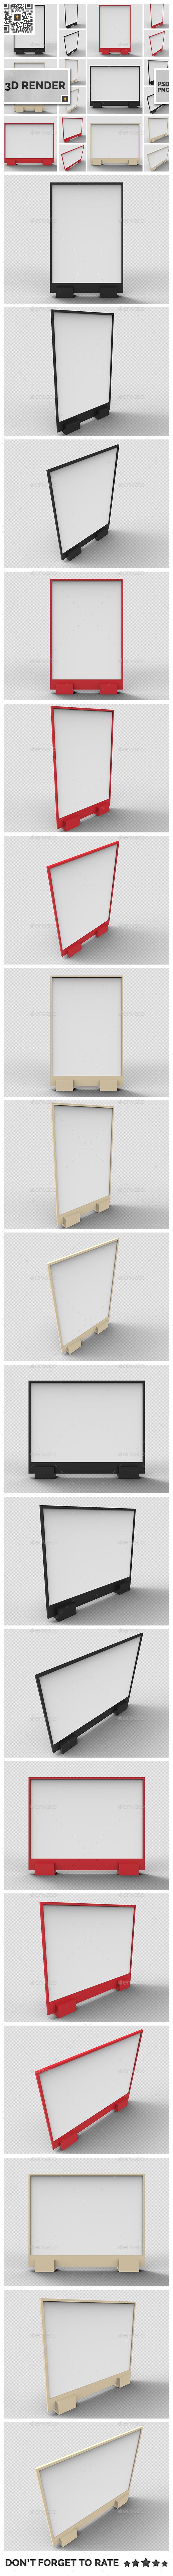 Flyer Display 3D Render - Objects 3D Renders